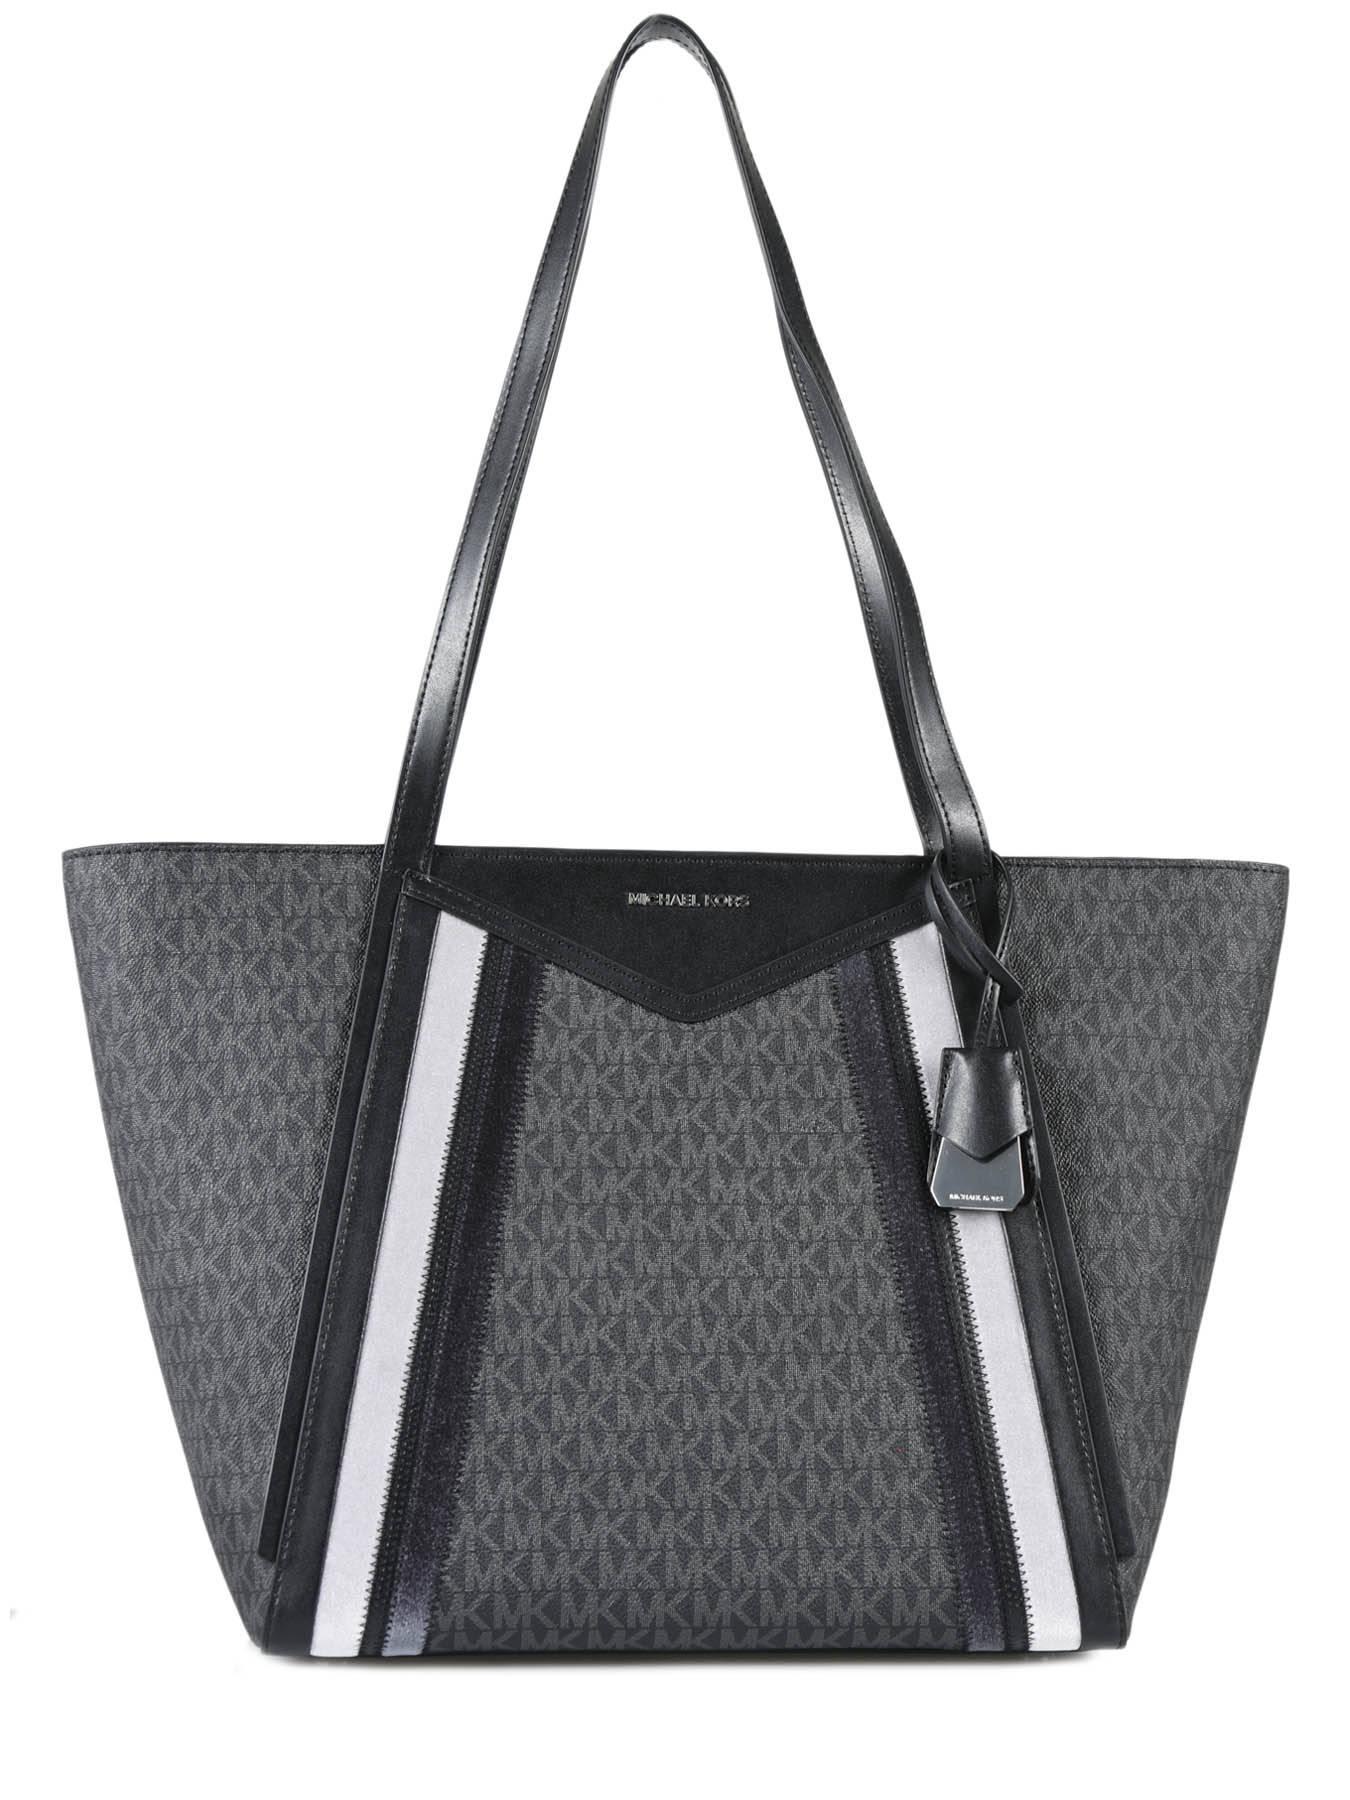 dae98a9f12 ... Shoulder Bag Withney Leather Michael kors Black withney F8SN1T7B ...